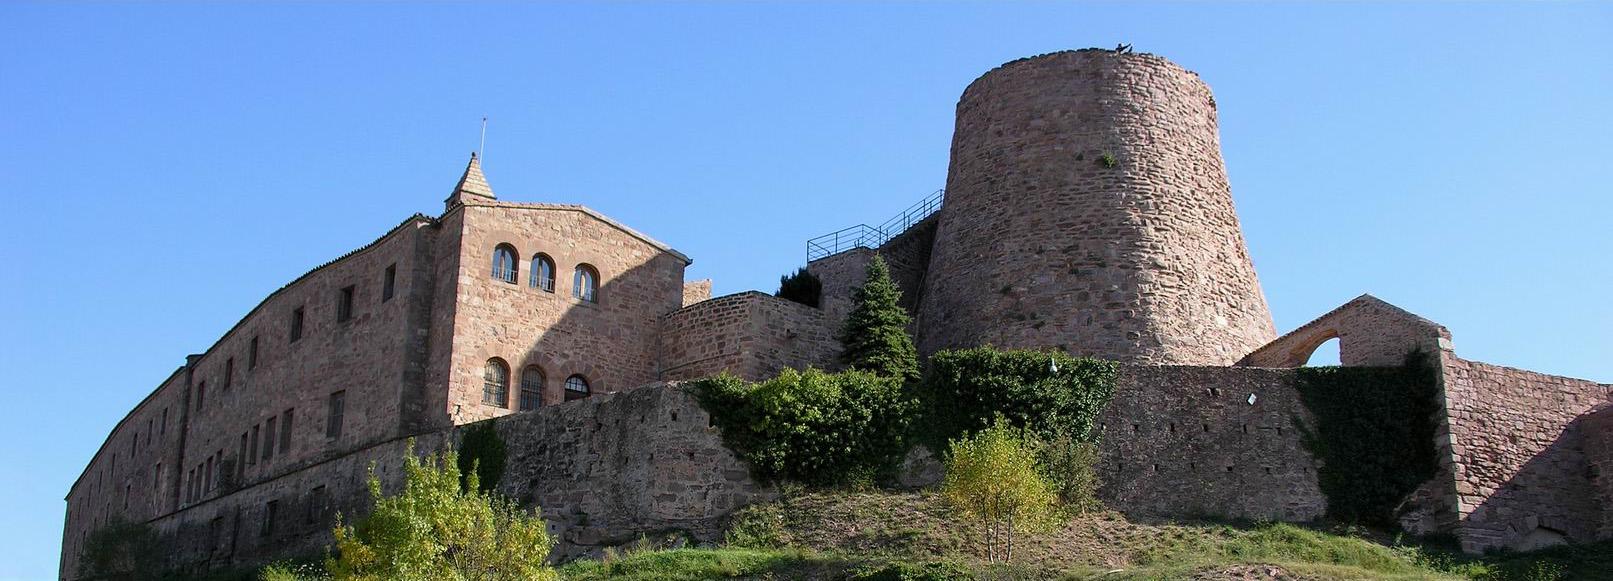 File:Castell de Cardona - 2.jpg - Wikimedia Commons